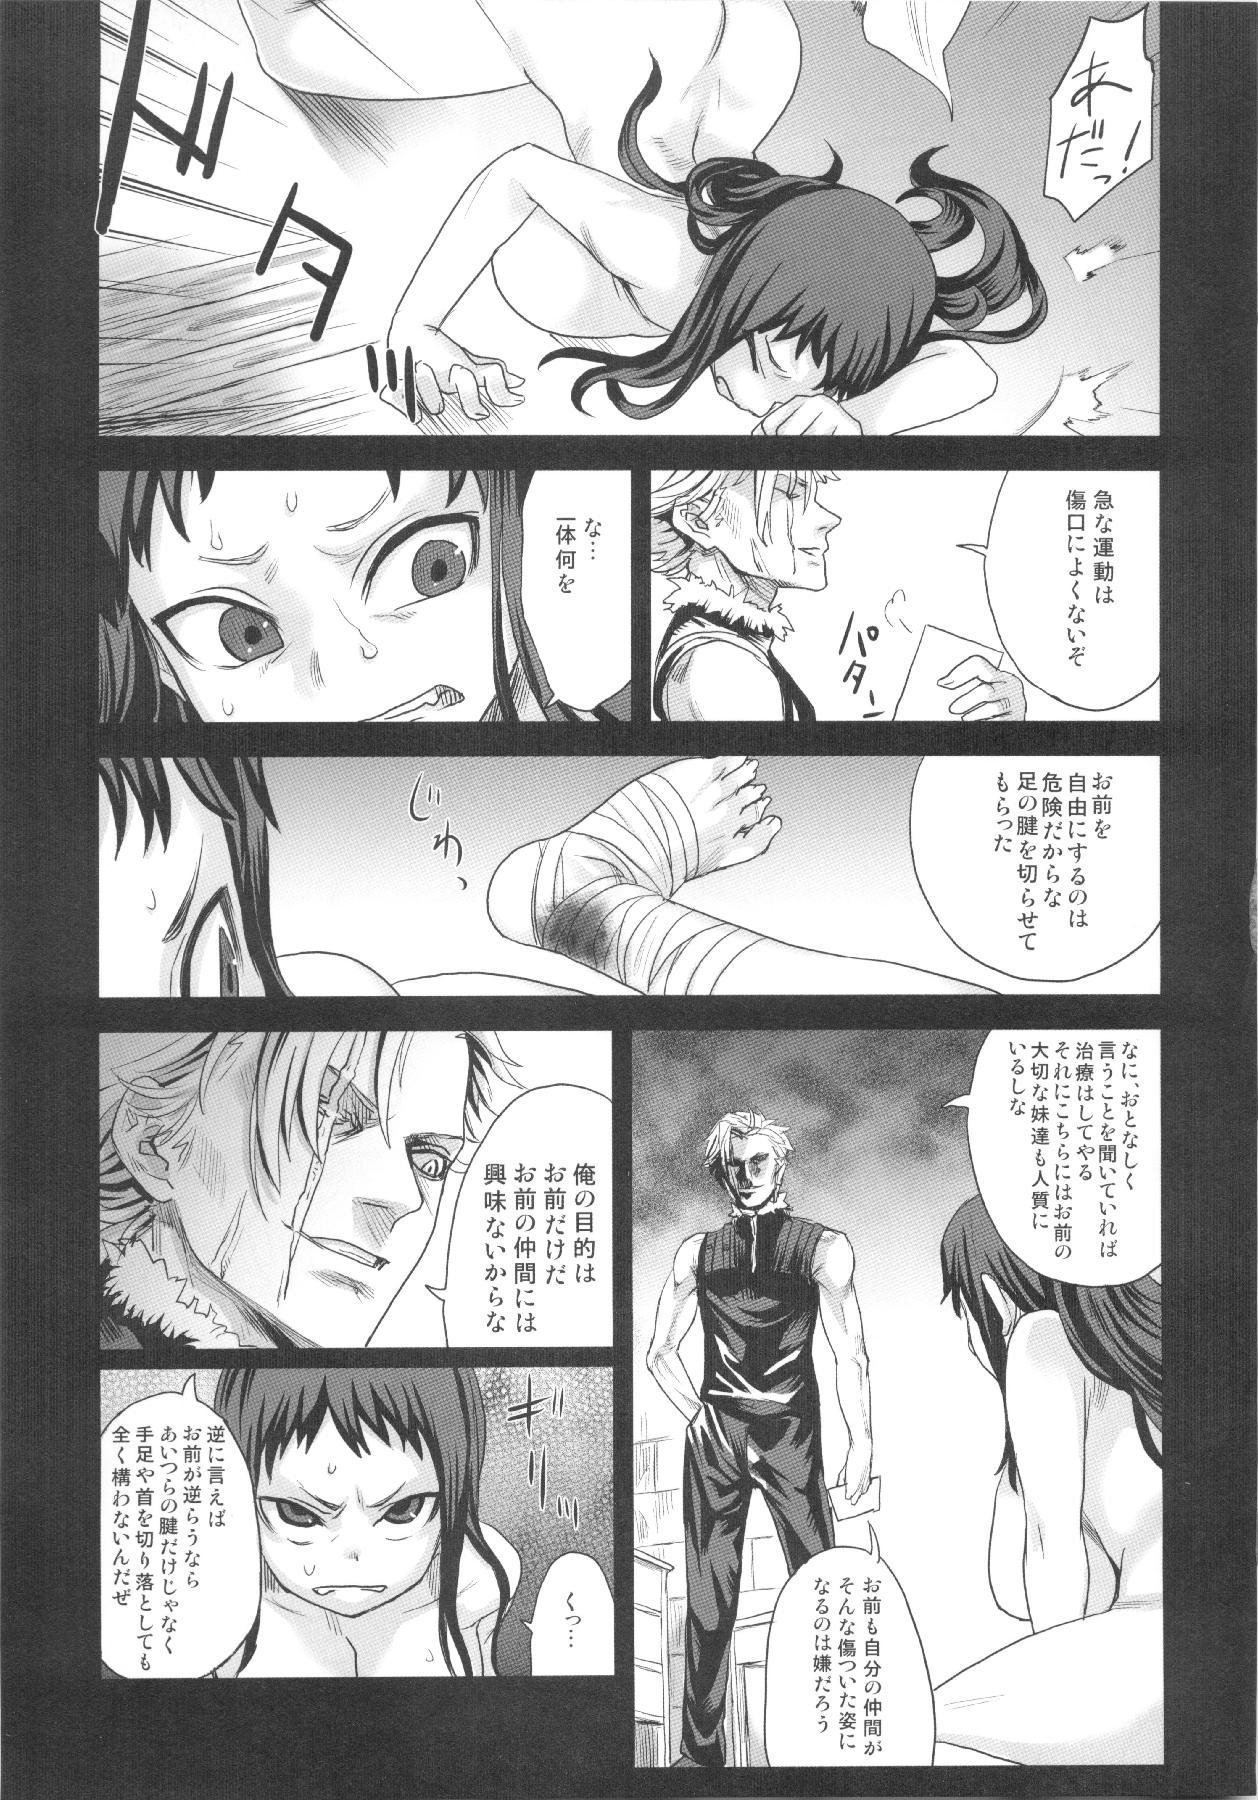 (C83) [Fatalpulse (Asanagi)] VictimGirls Compiled Vol.1 -Victimgirls Soushuuhen 1- MMO Game Selection (Various) 123